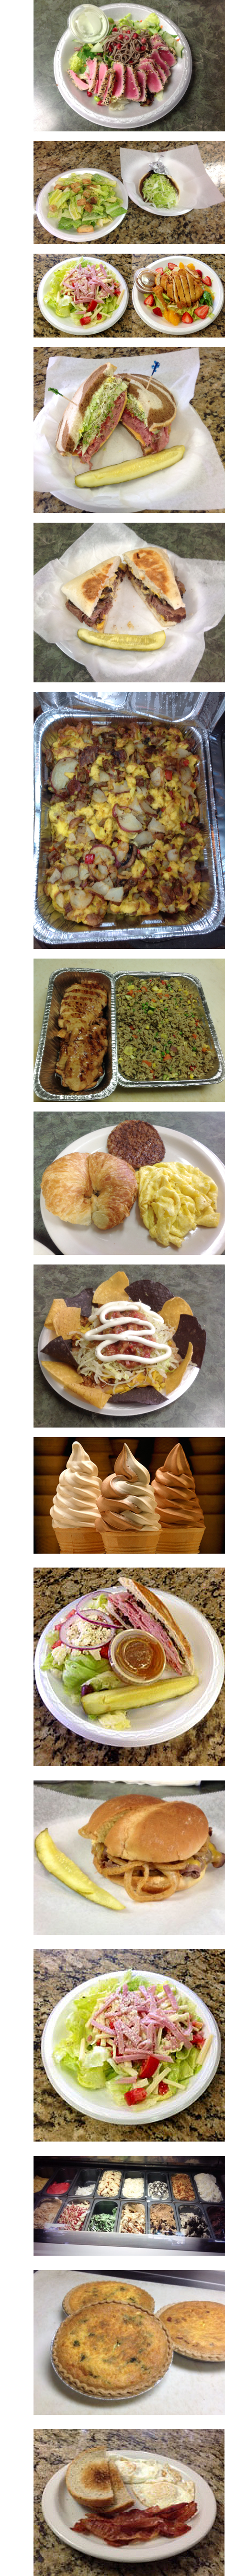 Lunch Menu | Sarasota, FL | Southside Deli | 941-330-9302